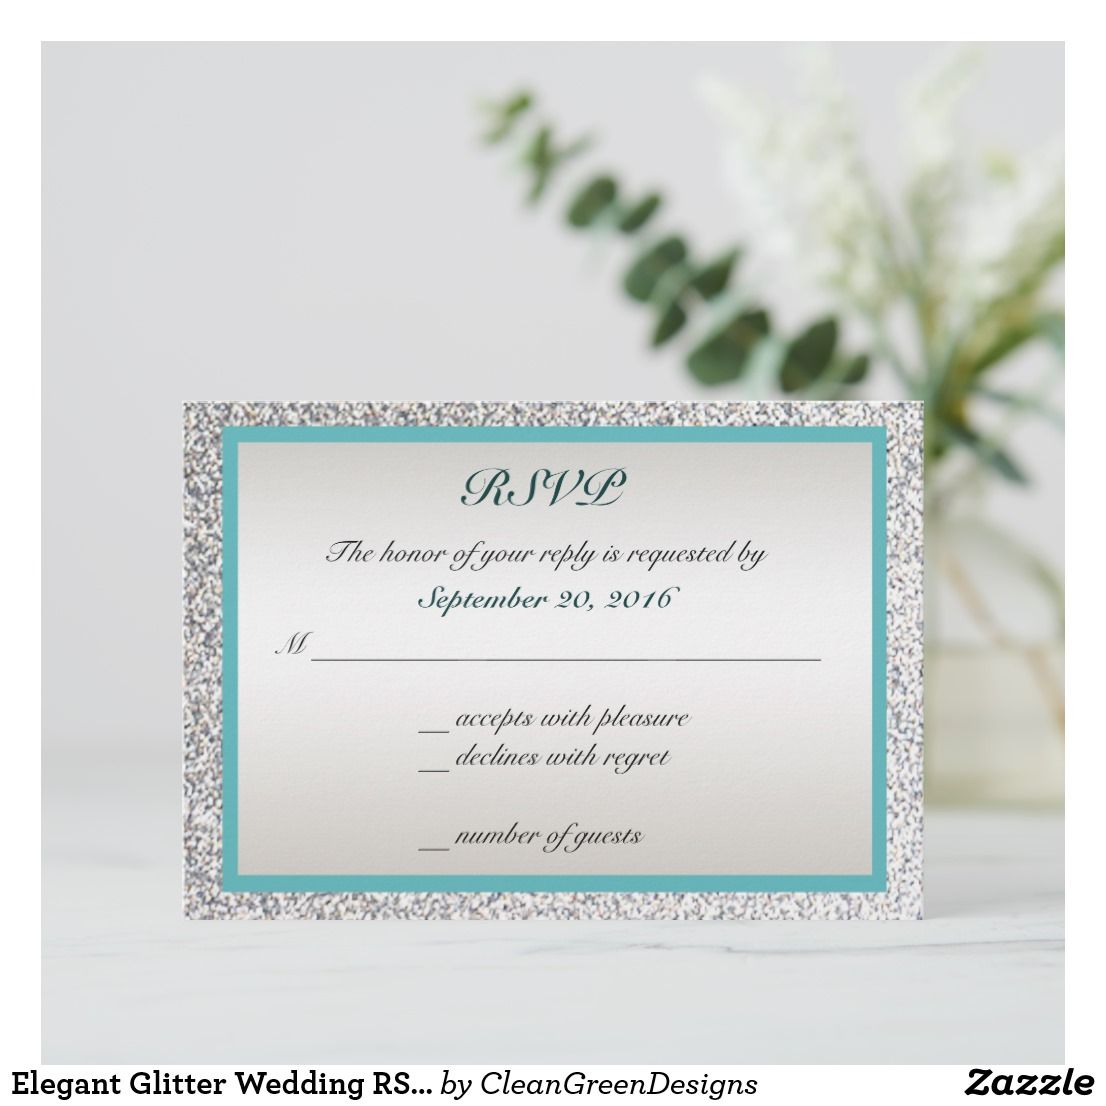 Elegant Glitter Wedding Rsvp: Pi Day Wedding Cards At Websimilar.org